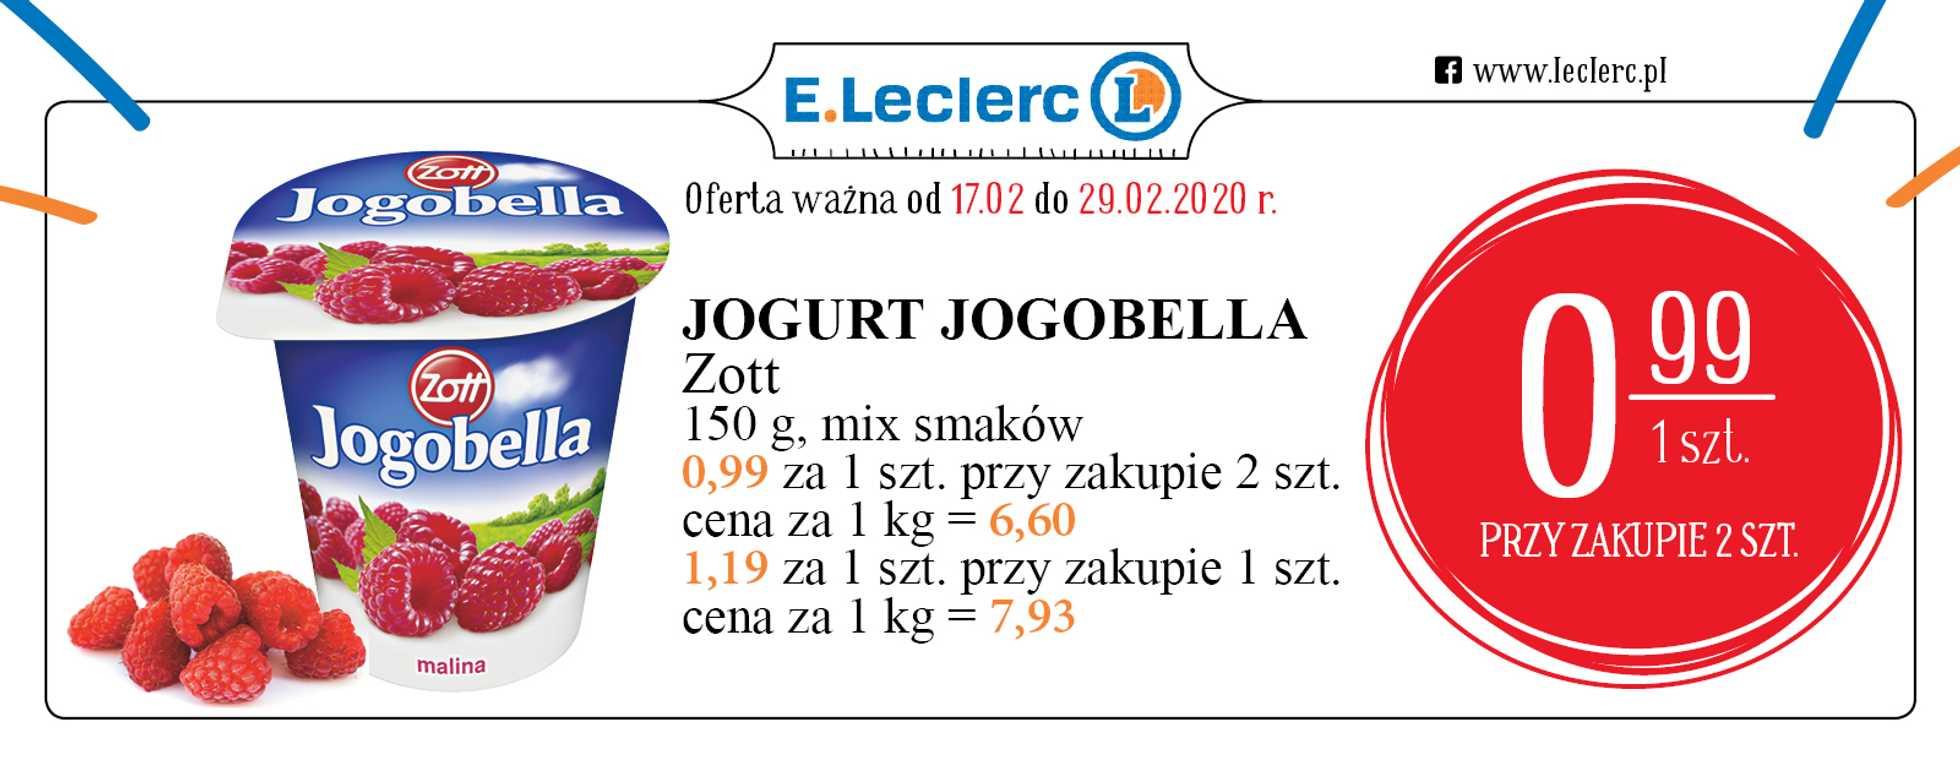 E.Leclerc - gazetka promocyjna ważna od 17.02.2020 do 29.02.2020 - strona 1.